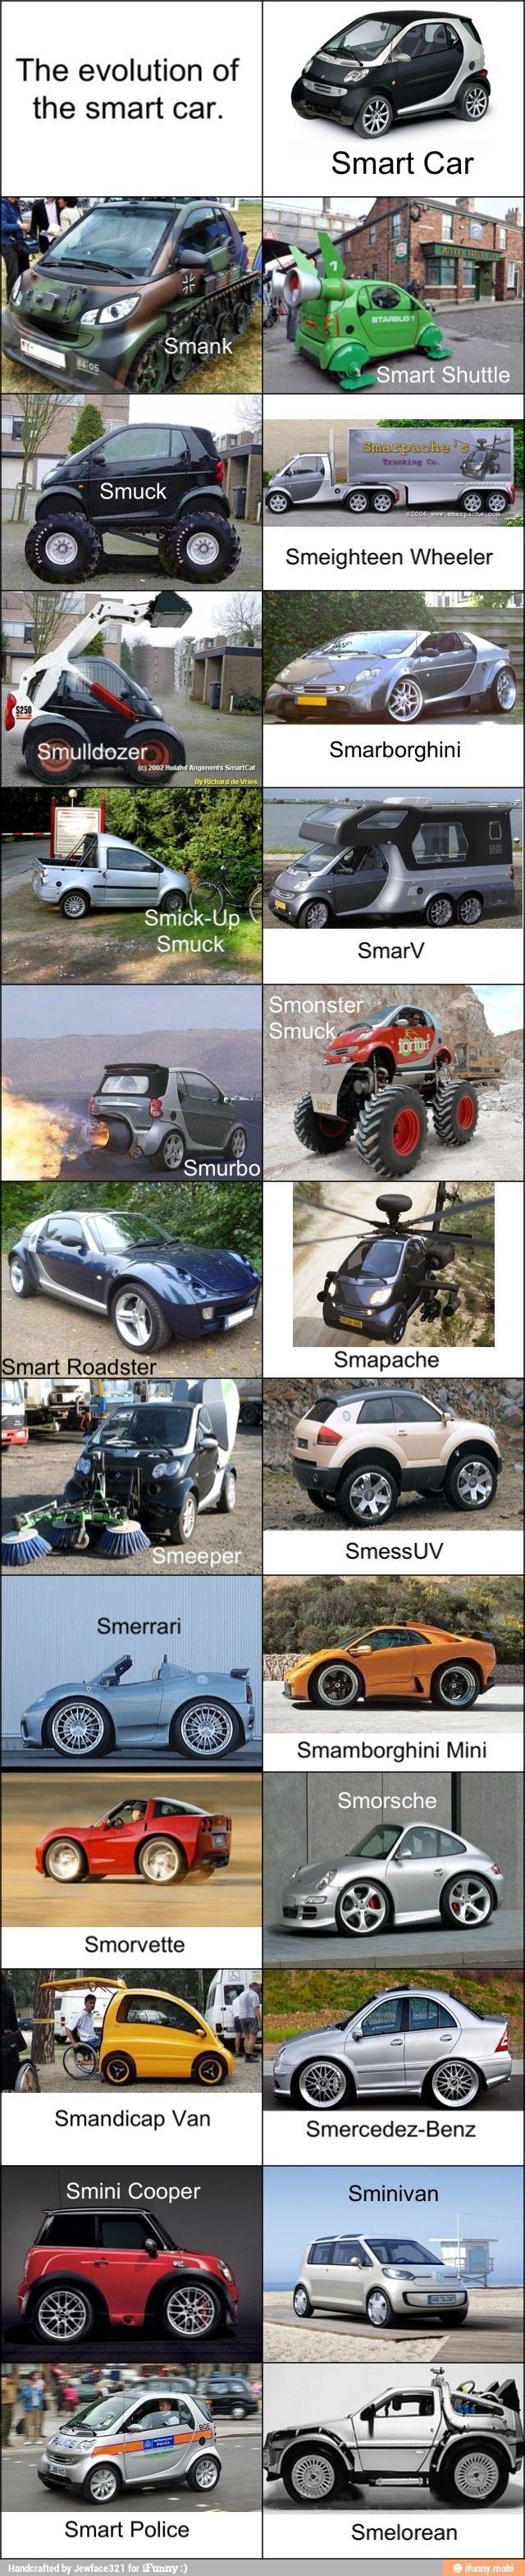 Smart car versatility